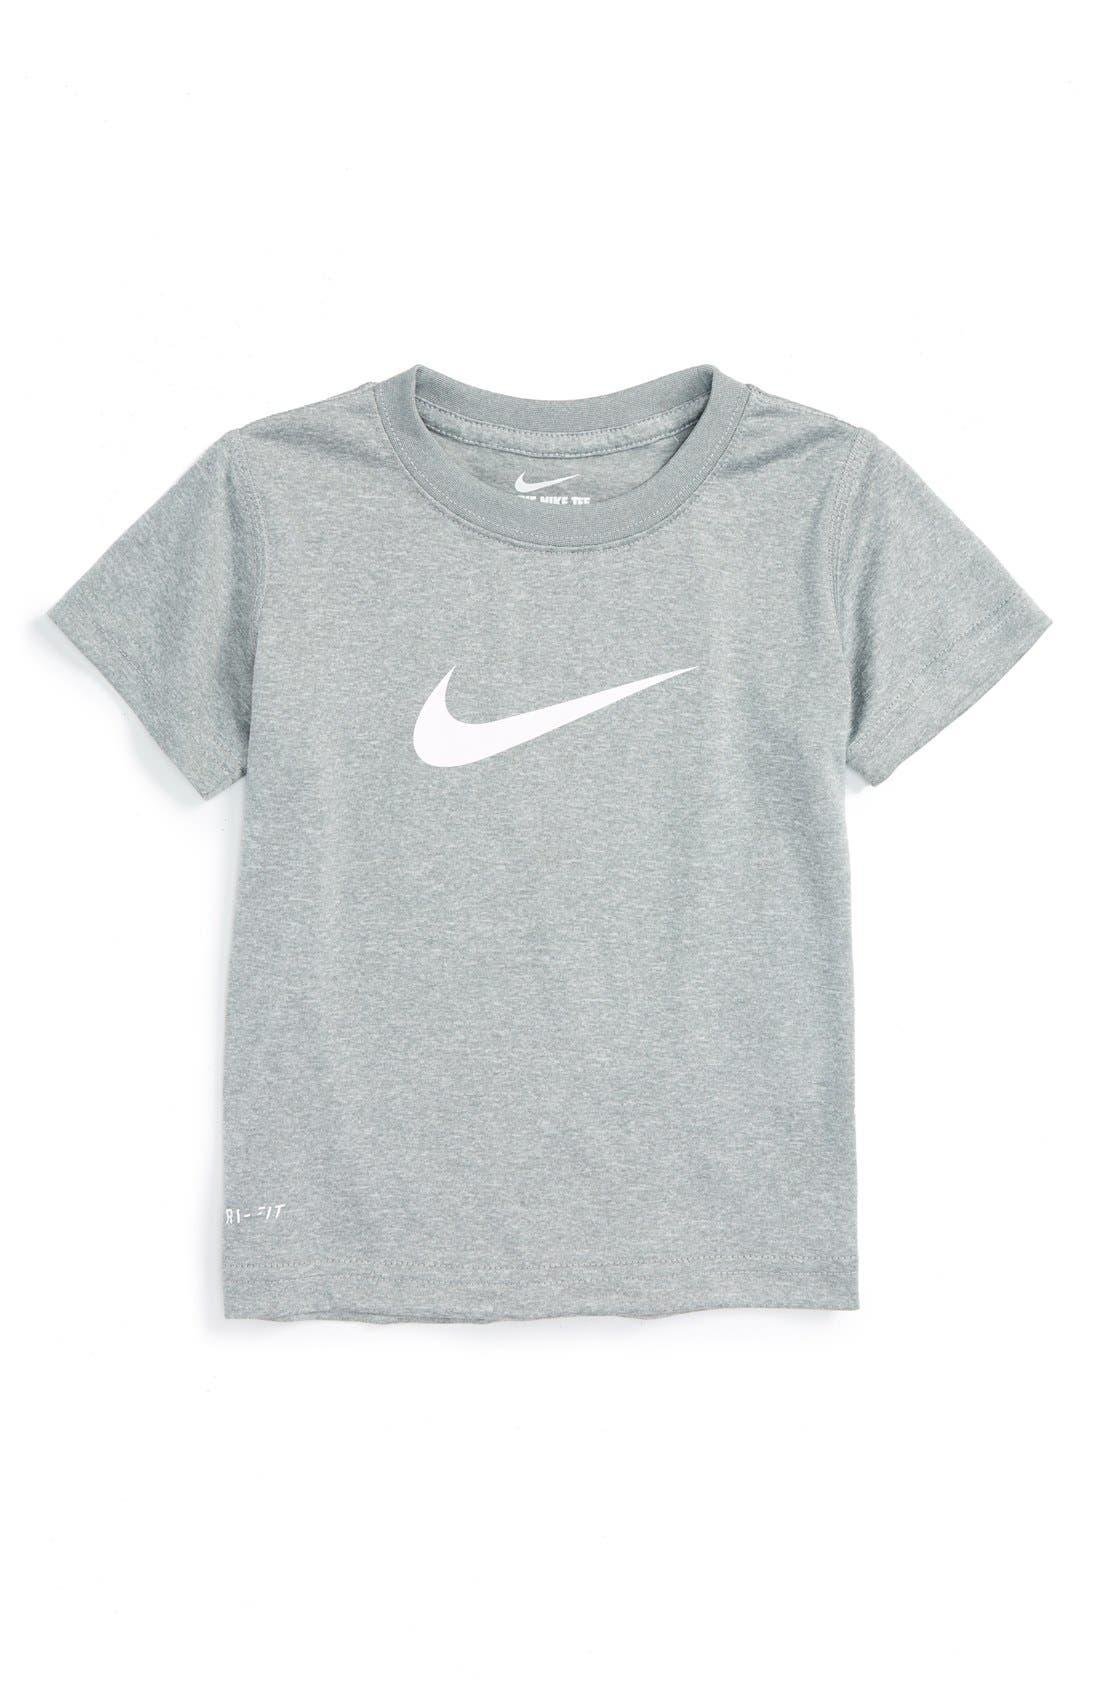 Nike 'Legend' Short Sleeve T-Shirt (Toddler Boys)